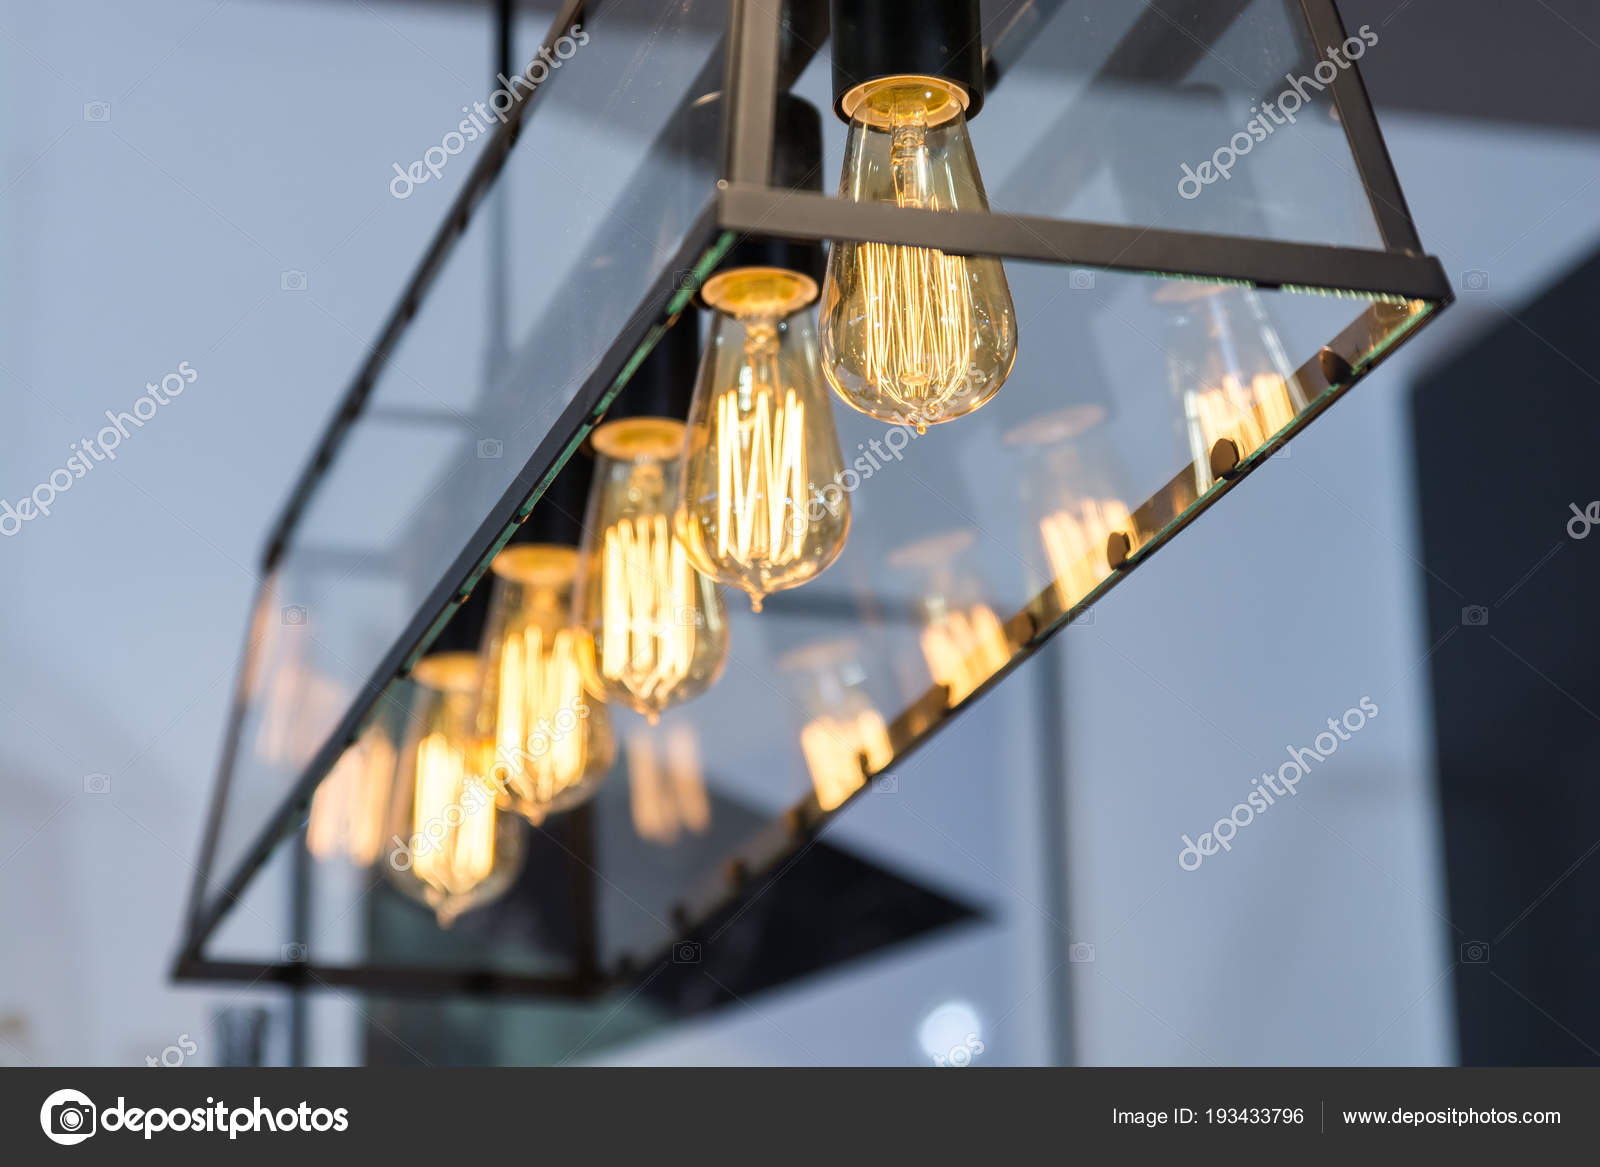 hanging kitchen light accent rugs 现代家庭内部厨房内饰挂灯 图库照片 c richard salamander 193433796